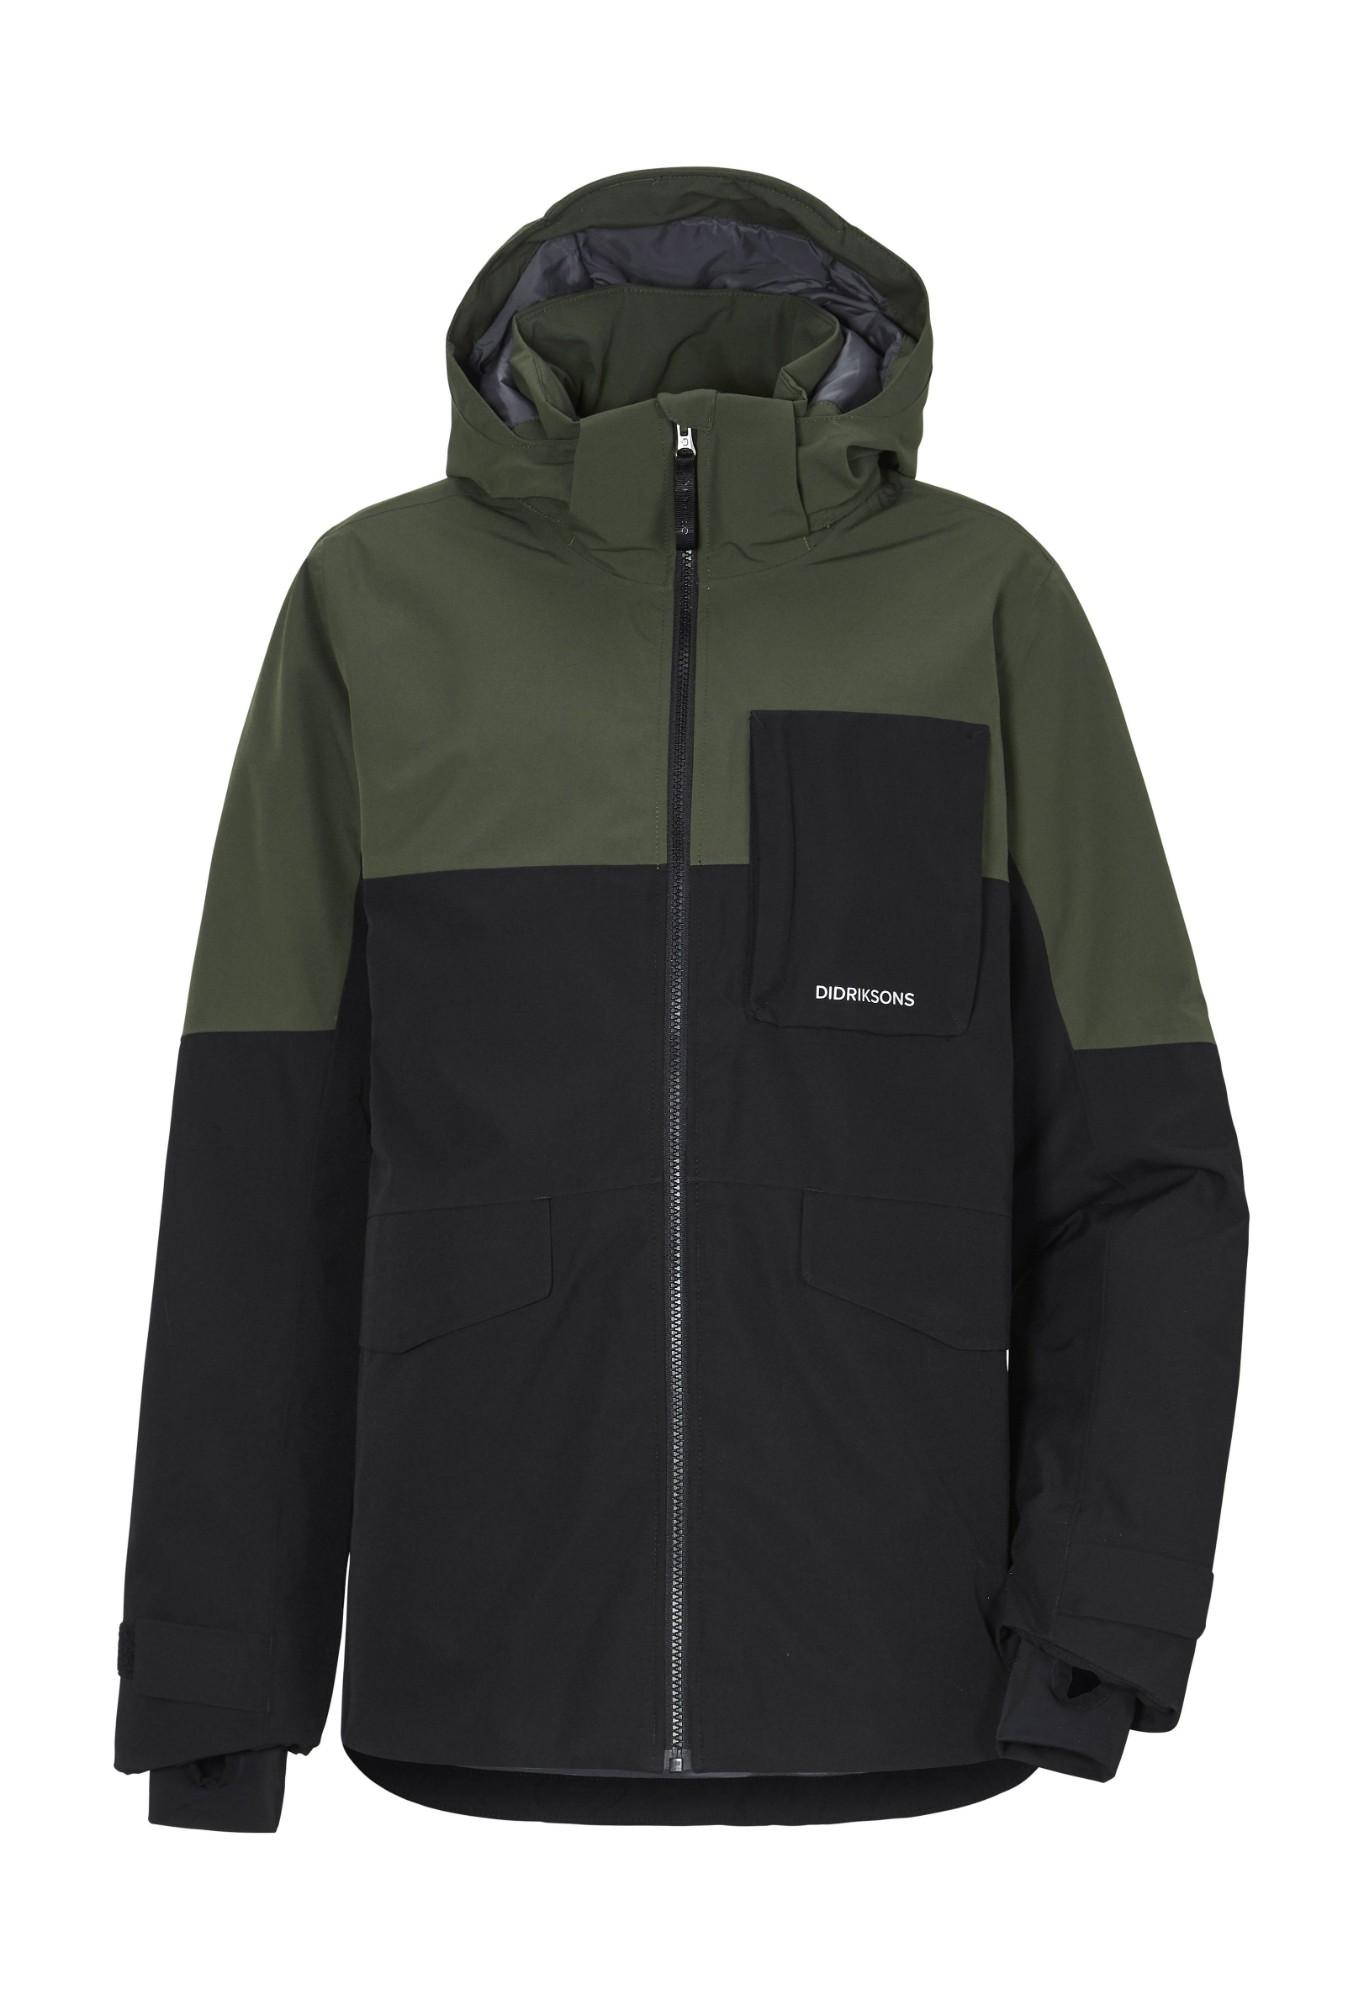 DIDRIKSONS Luke Boy's Jacket 2 Black 140